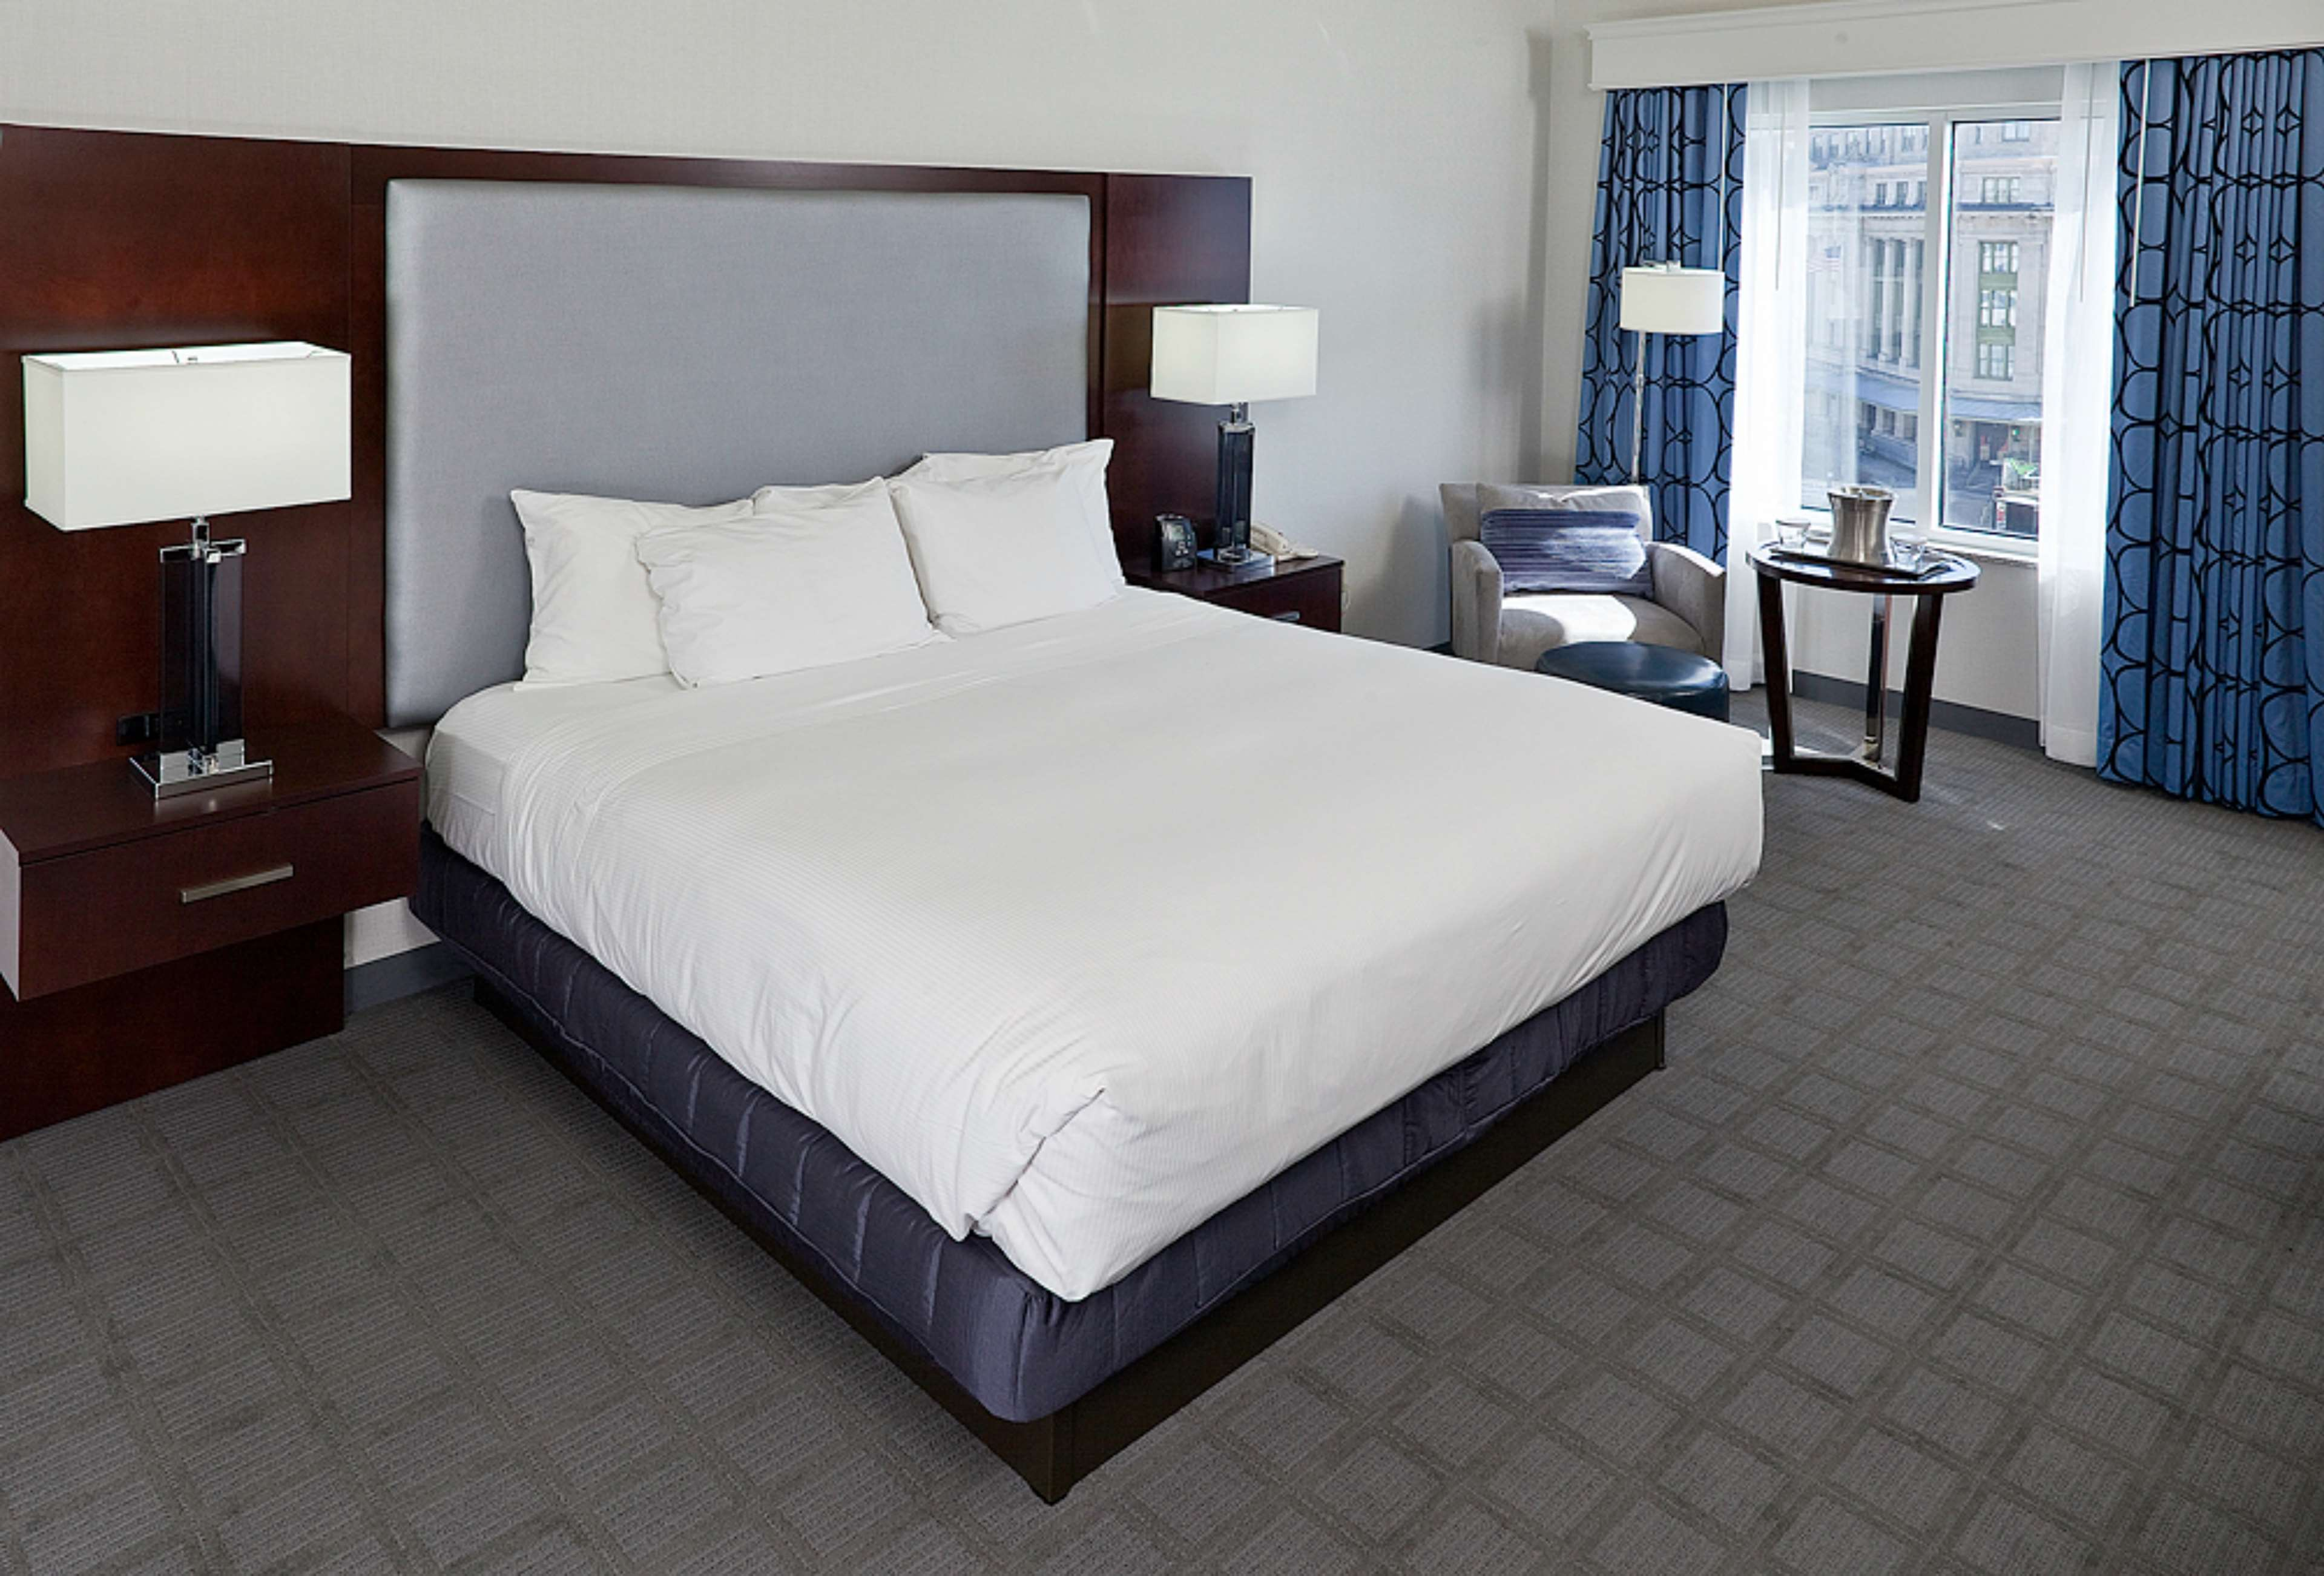 Hilton Scranton & Conference Center image 17